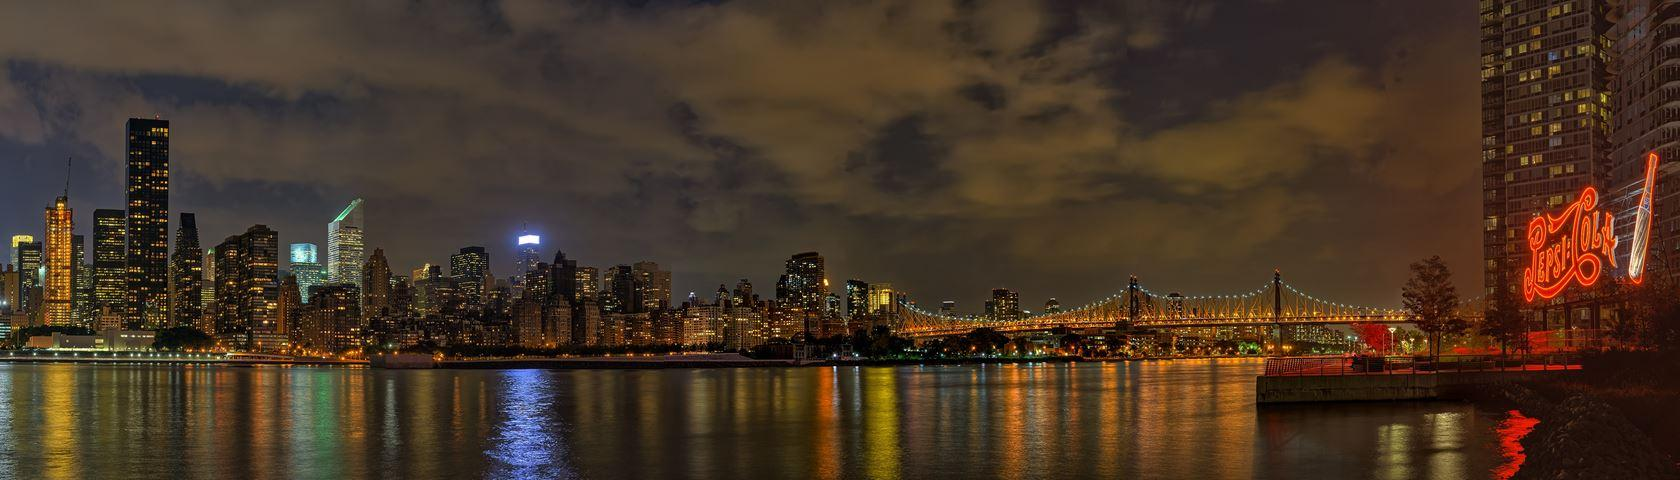 WallpaperFusion new york panorama 1680x480 Digital Trends 1680x480